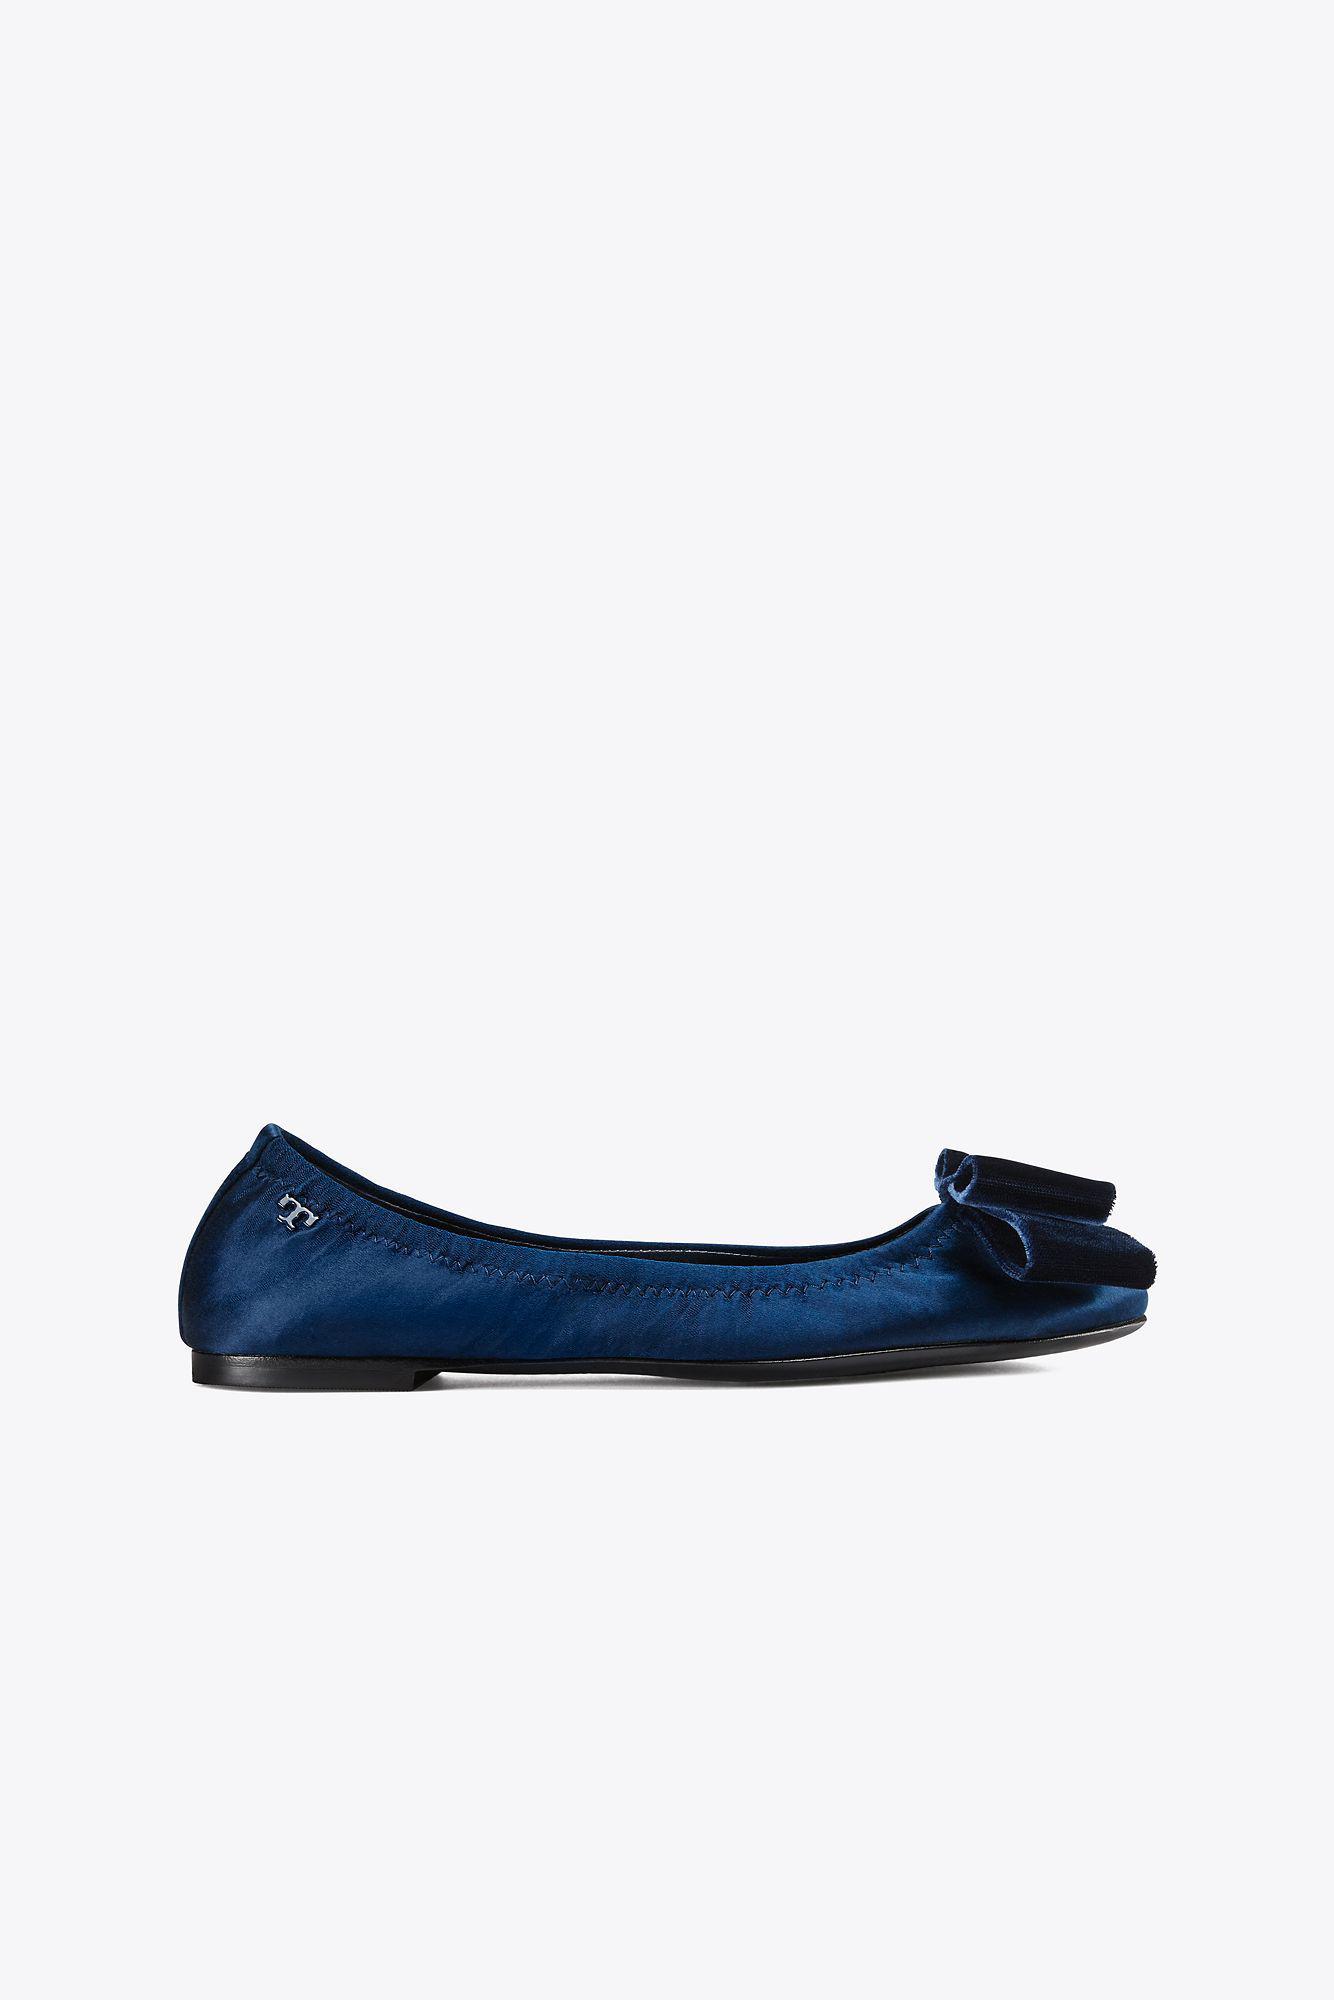 d9fbb500bd2 Lyst - Tory Burch Viola Bow Ballet Flat in Blue